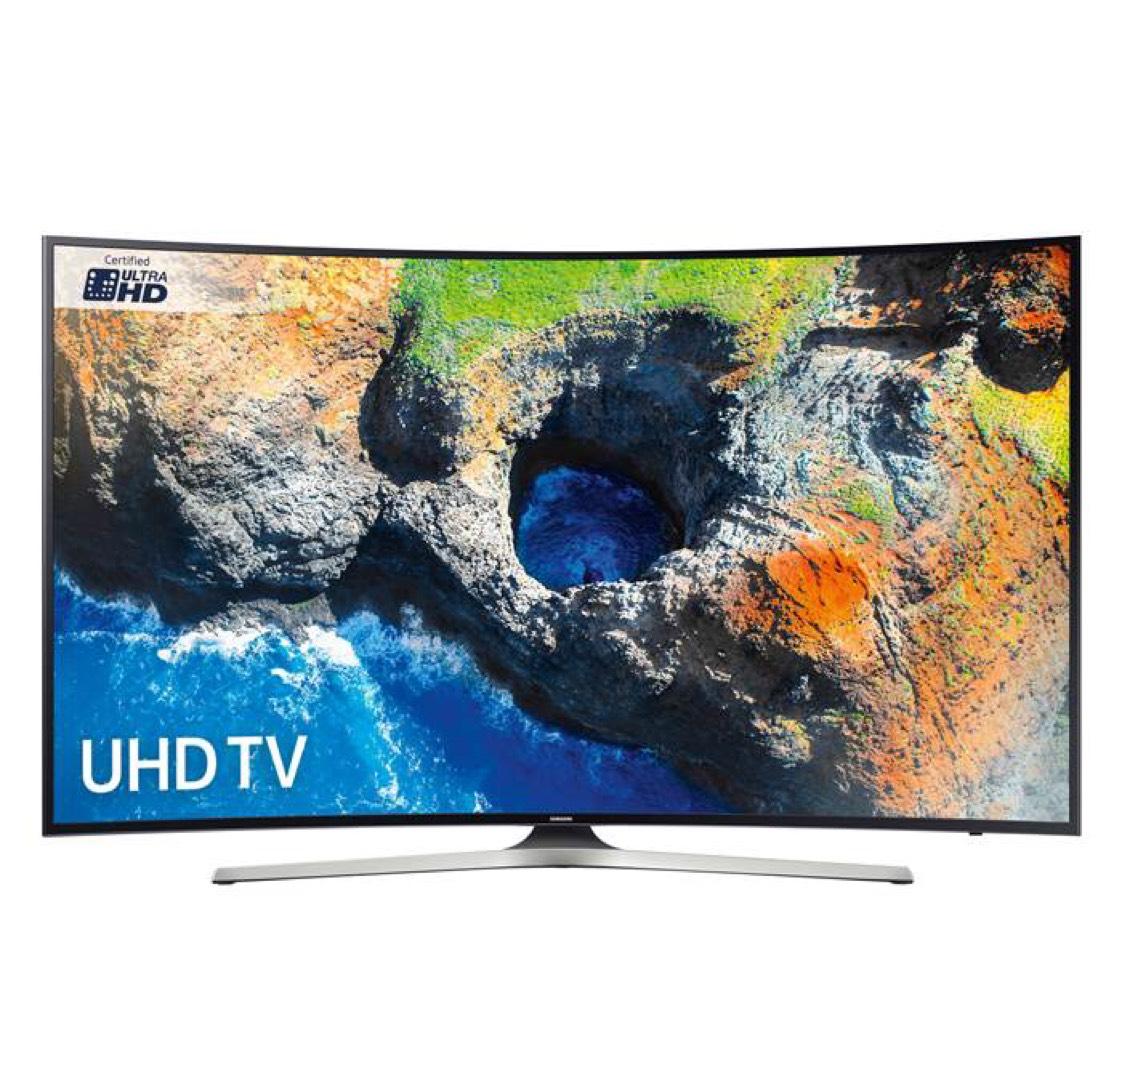 Samsung UE55MU6220 Black - 55inch 4K Ultra HD Curved TV - £529 with code - Co-op Electrical